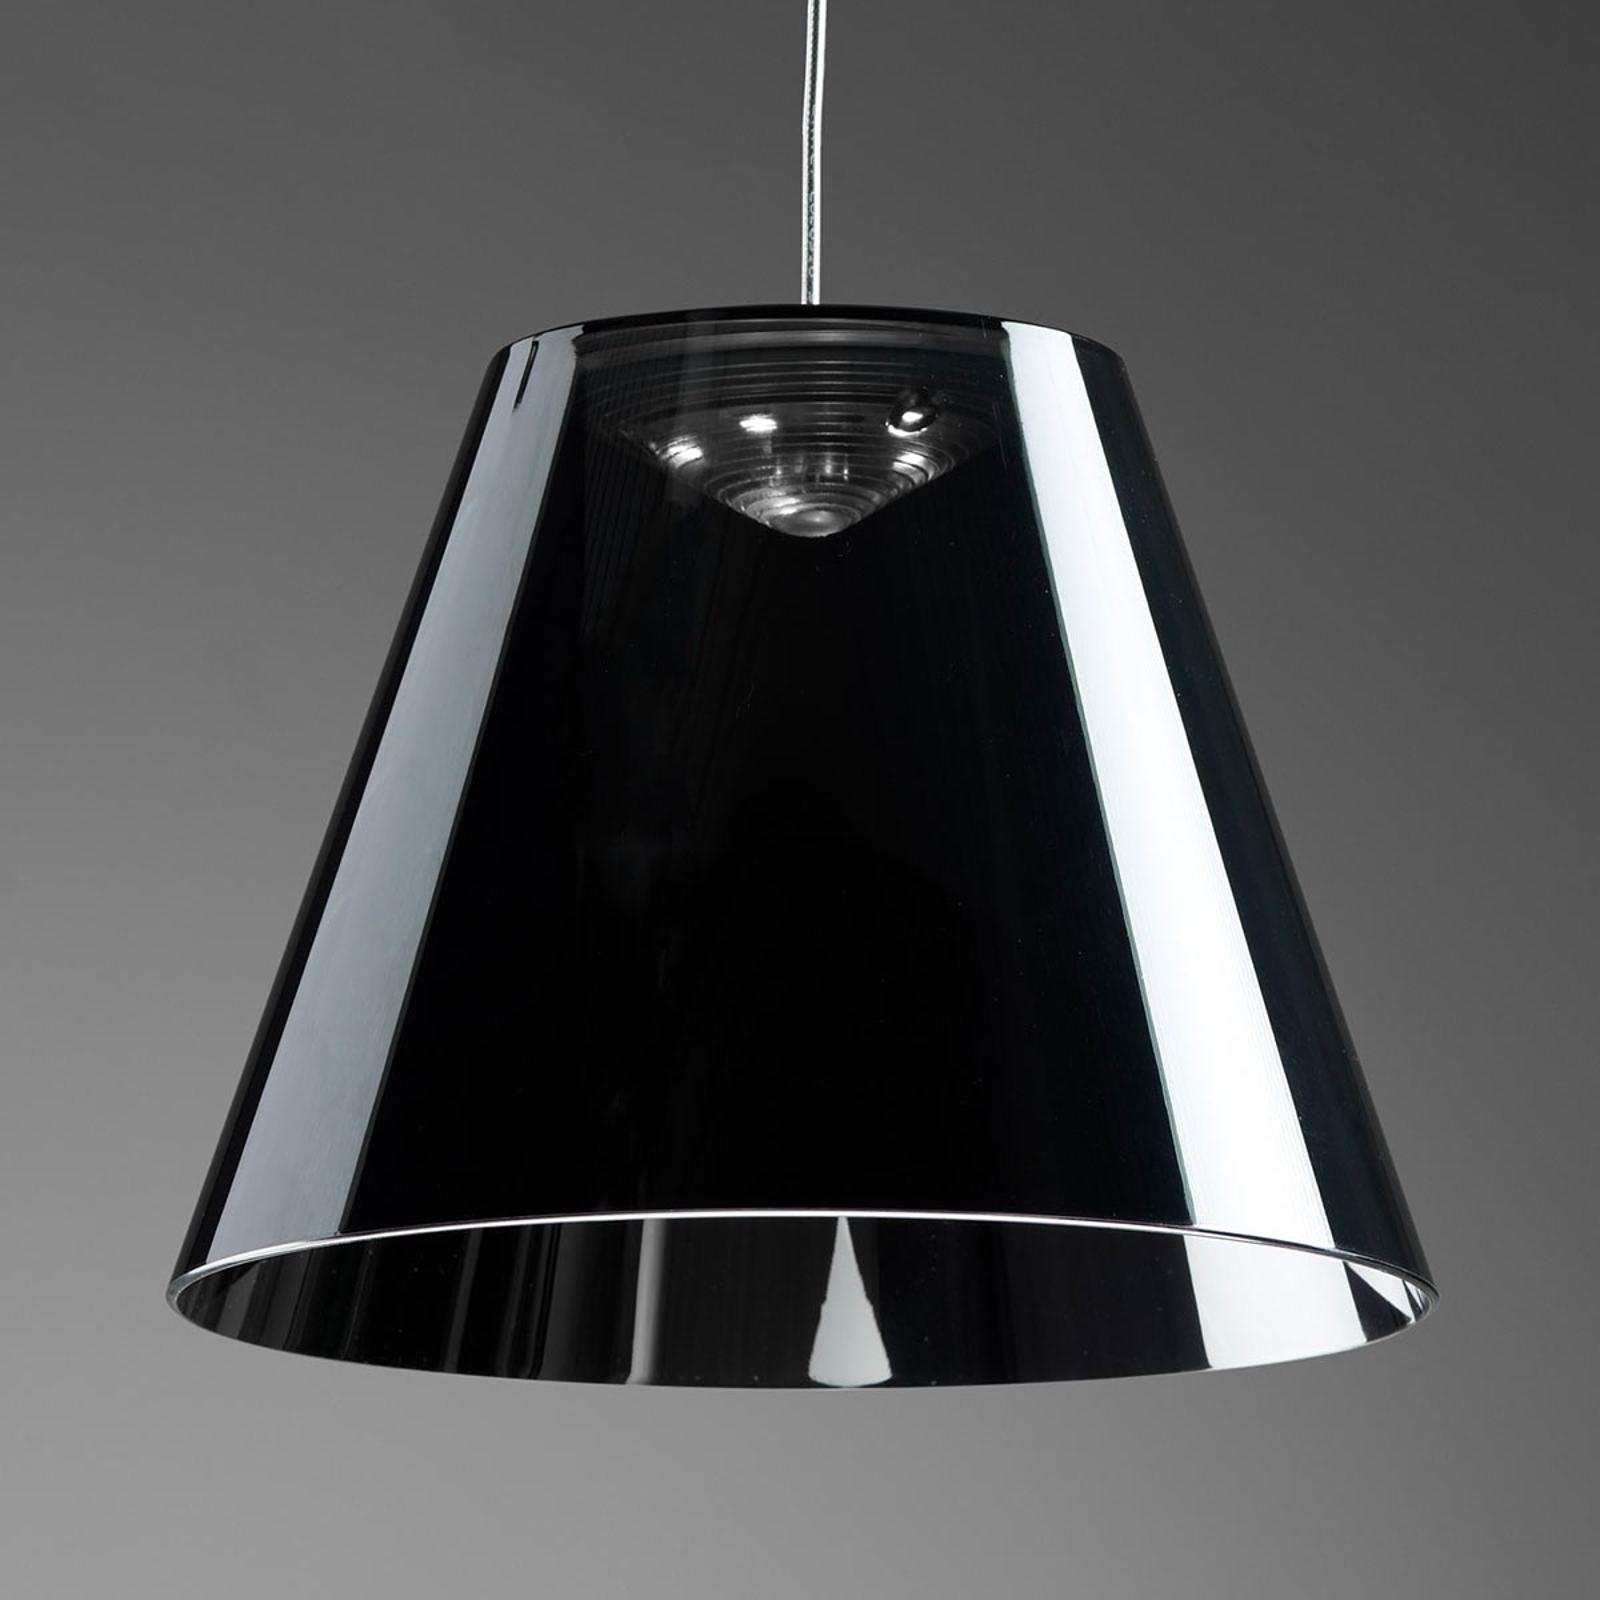 Rotaliana Dina - schwarze LED-Hängeleuchte